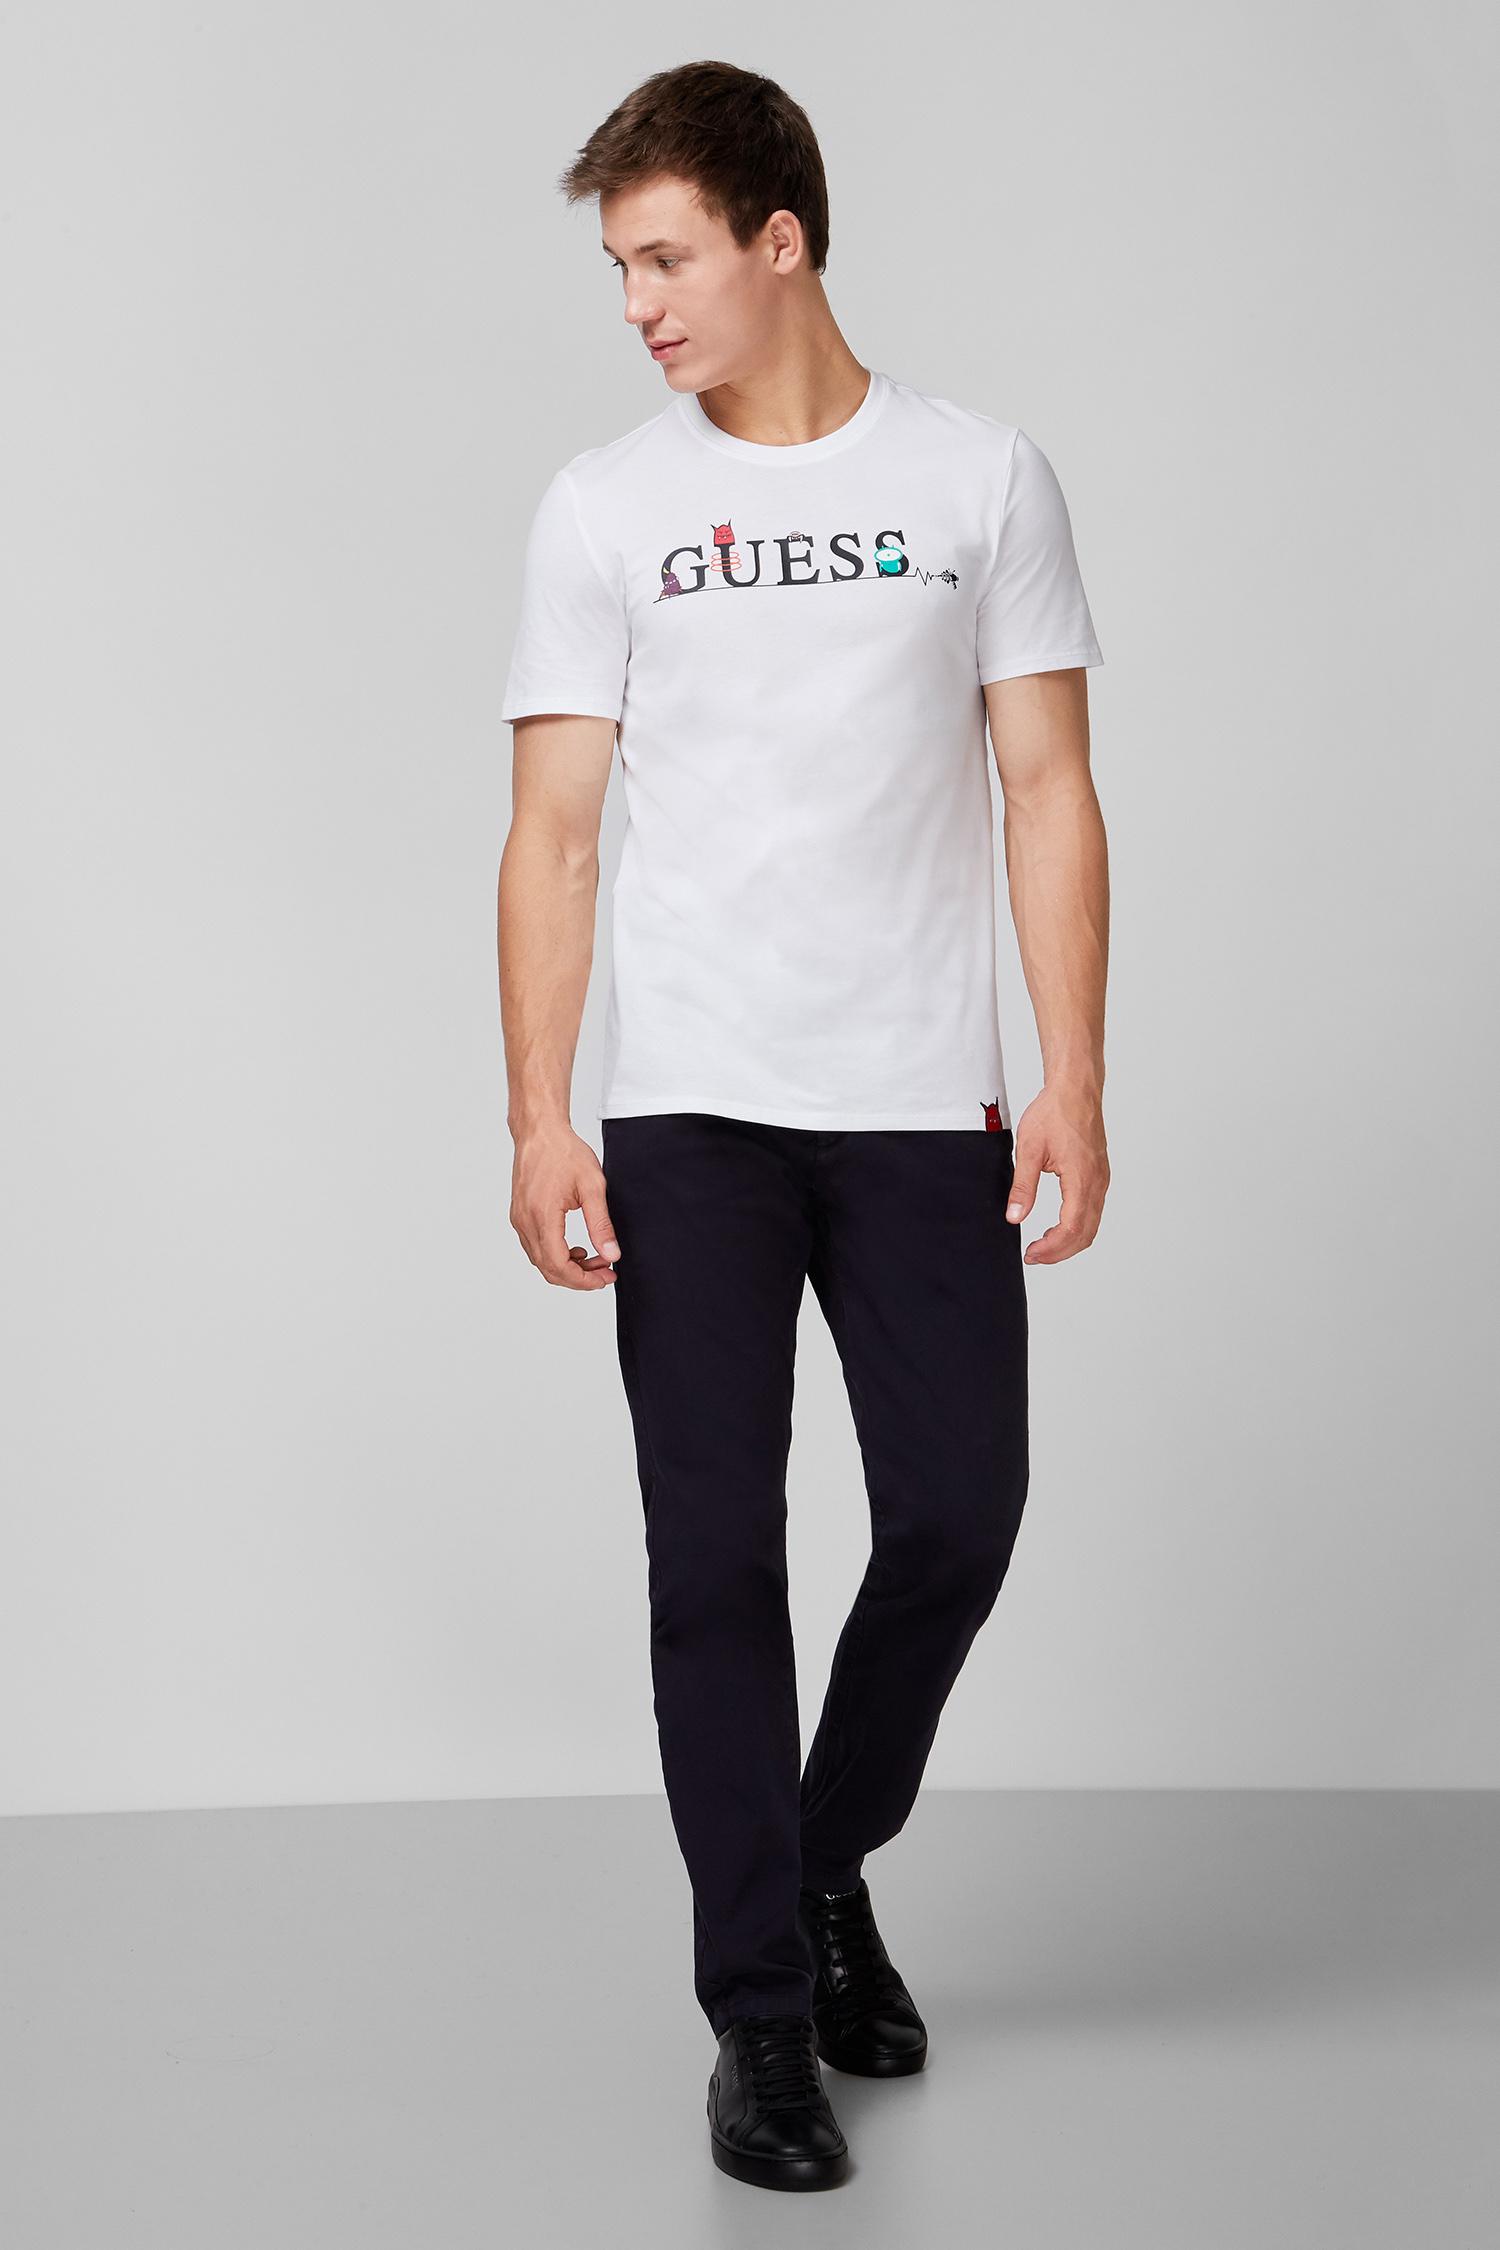 Мужская белая футболка с принтом Guess M0YI48.I3Z00;TWHT